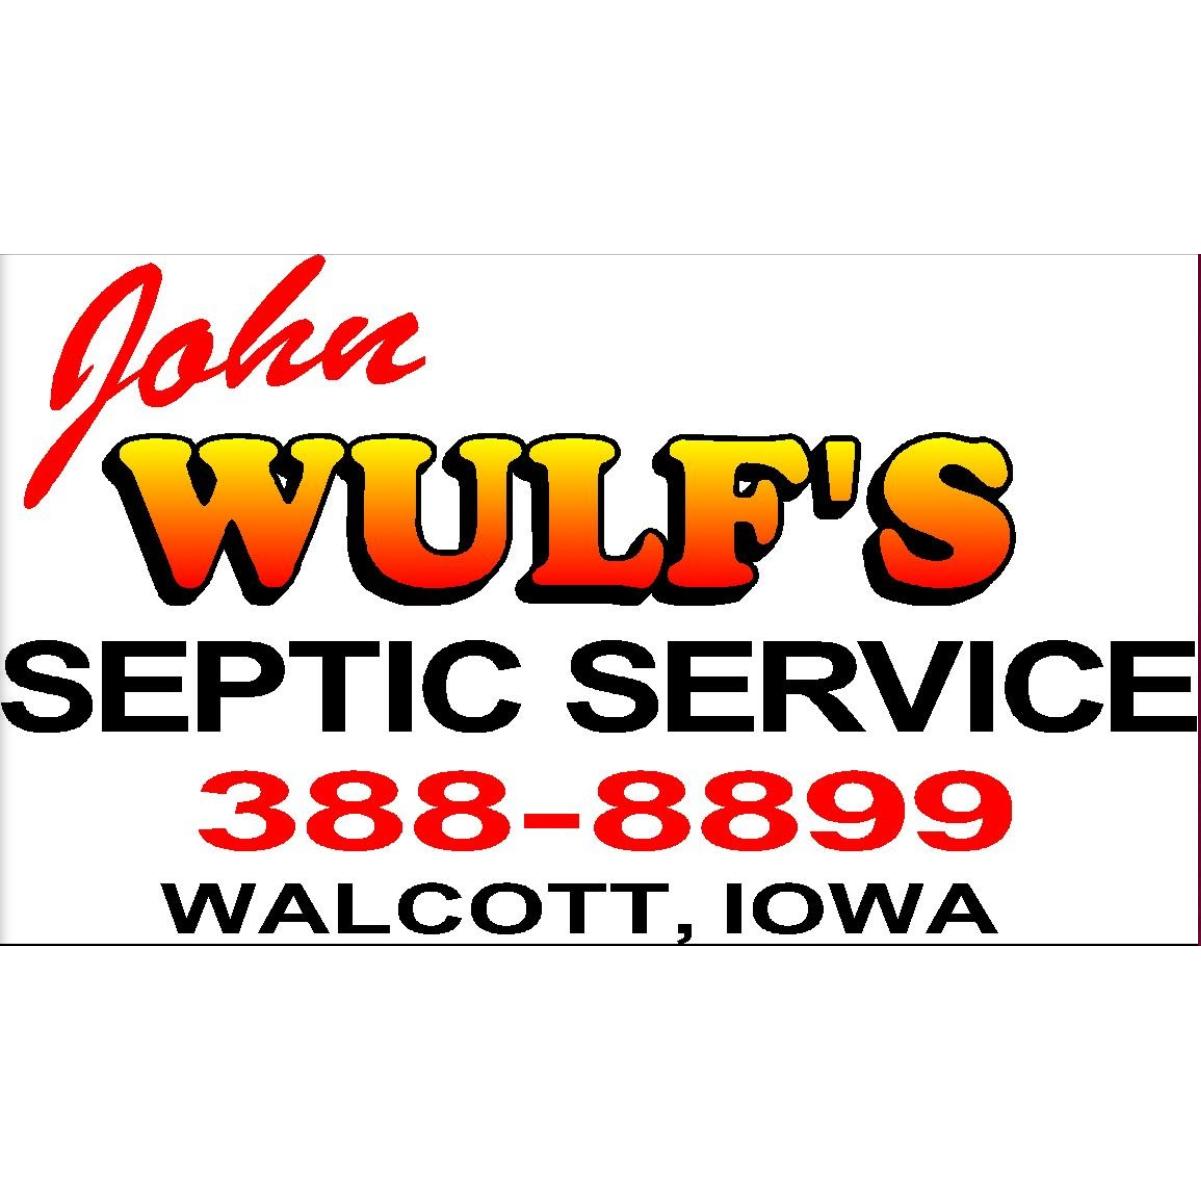 John Wulf's Septic Tank Service, LLC Logo